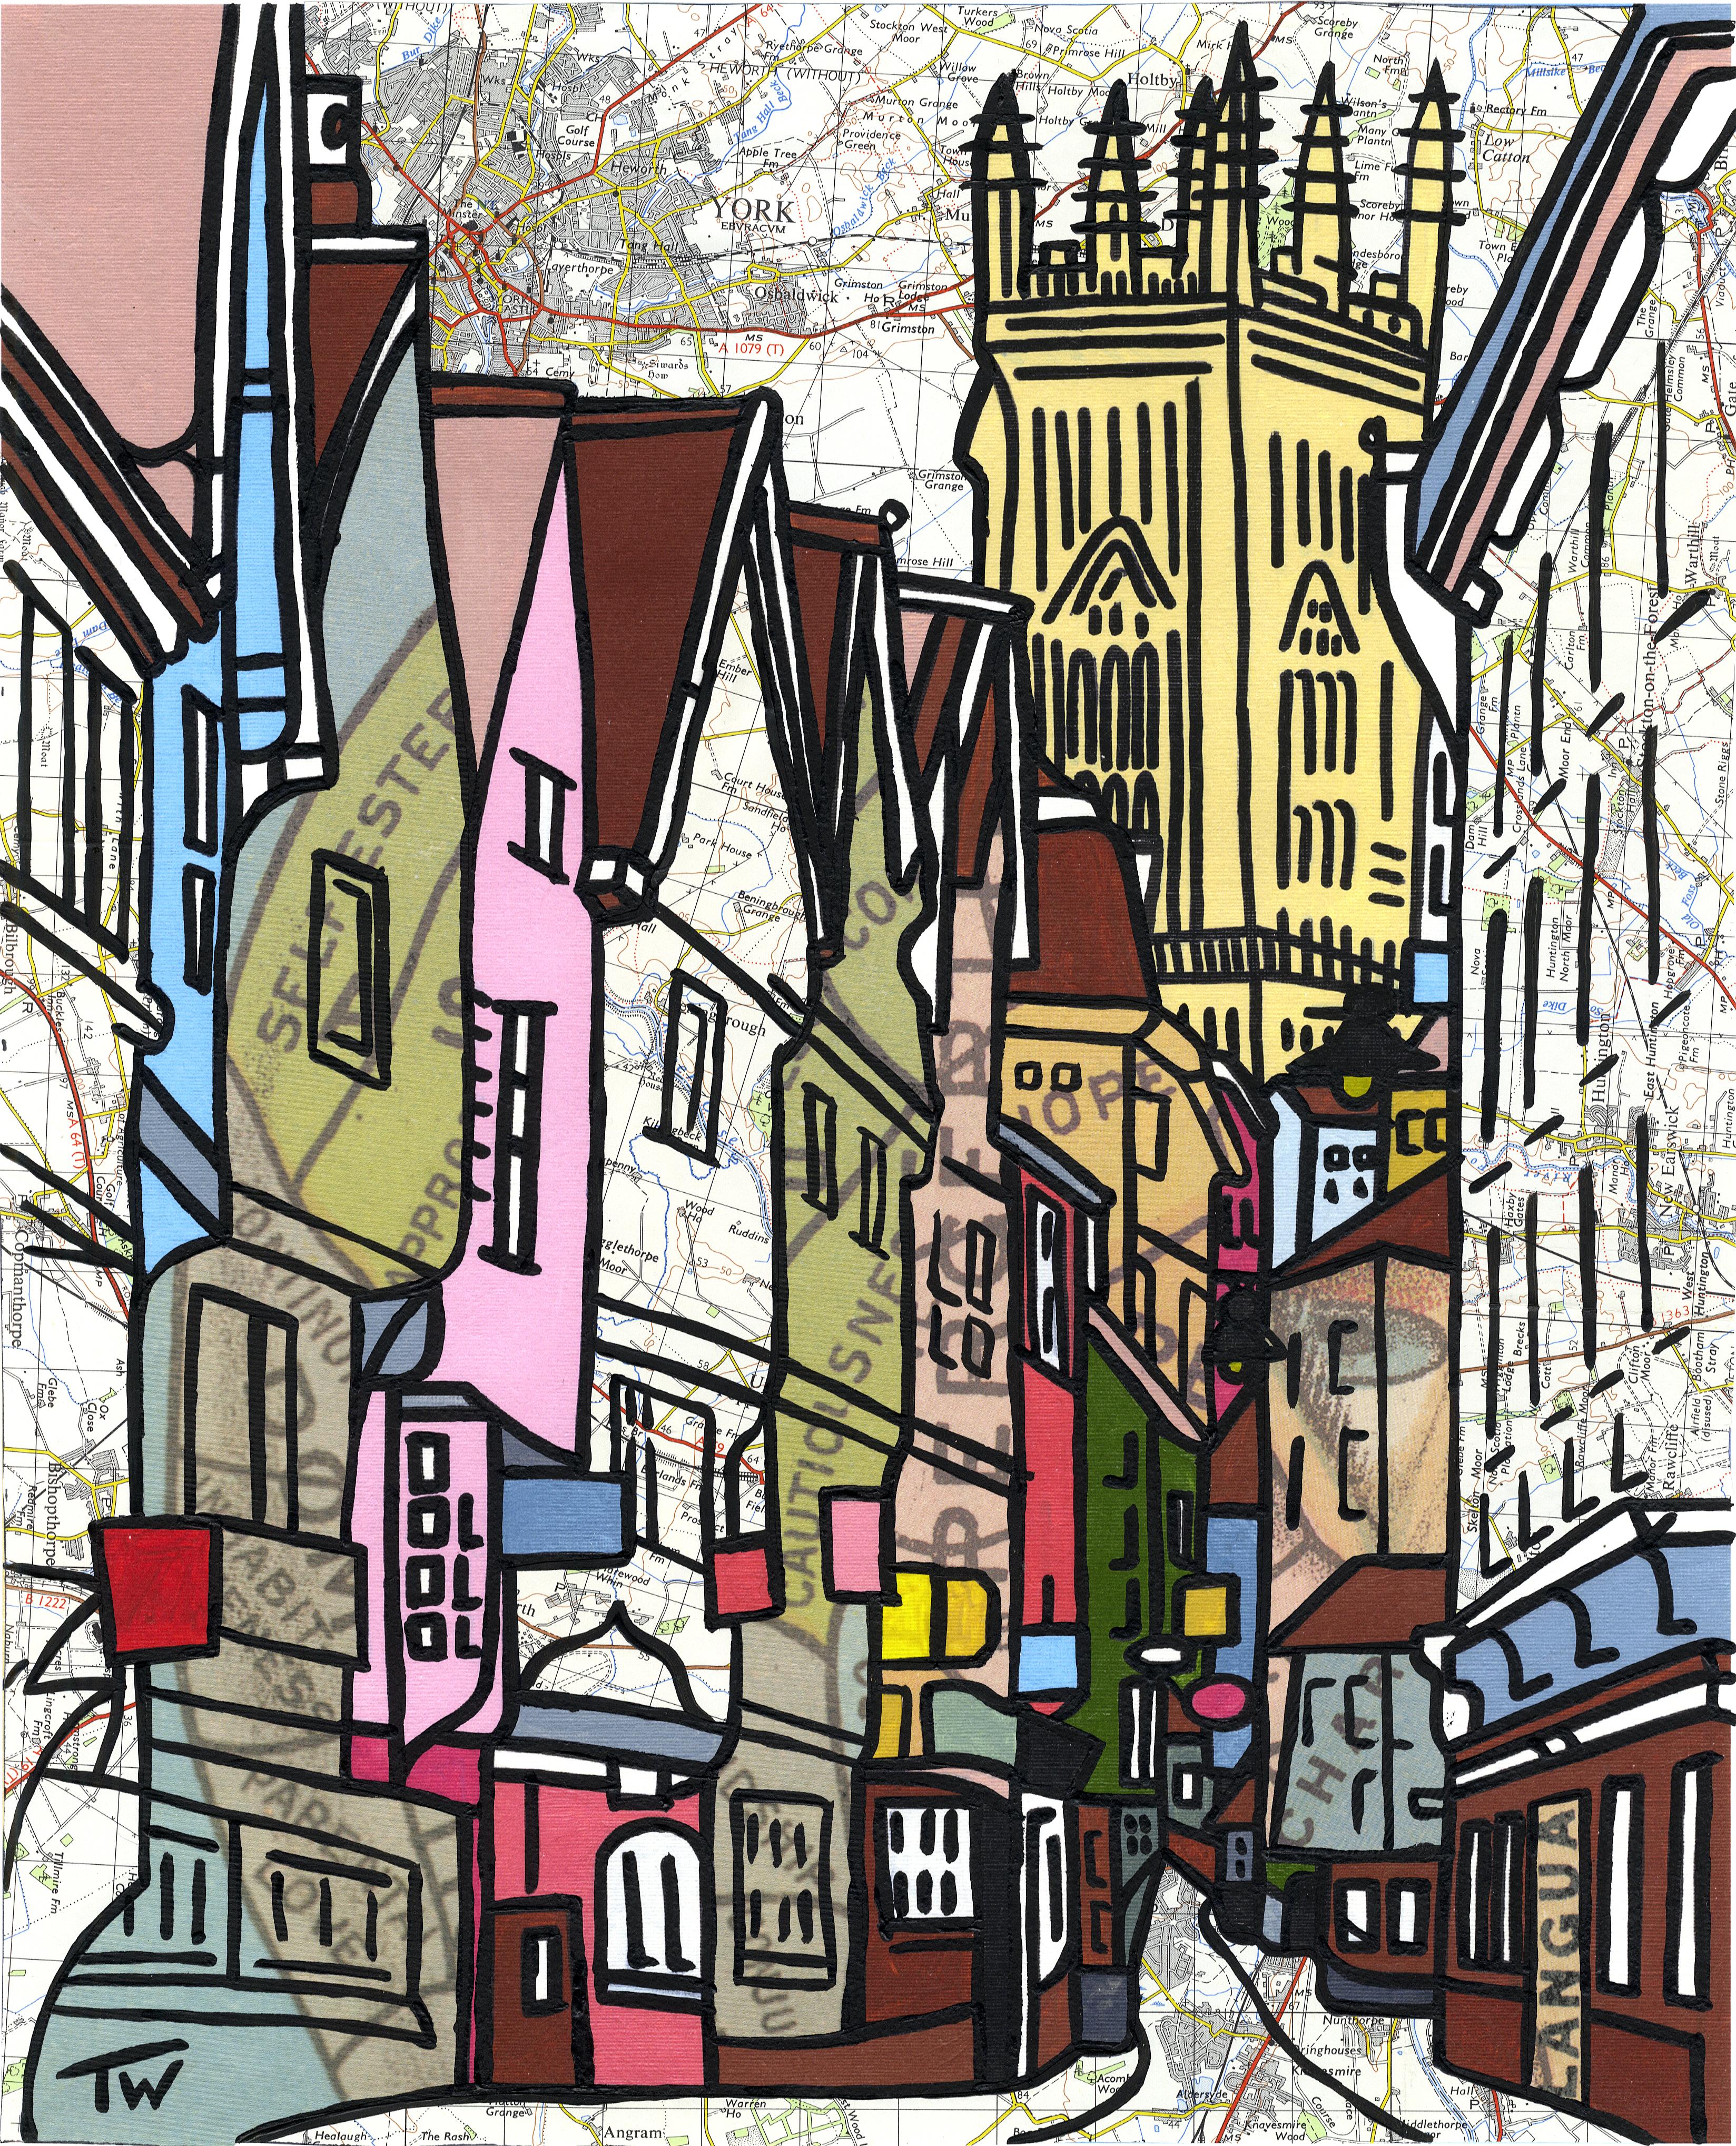 'Low Petergate, York'